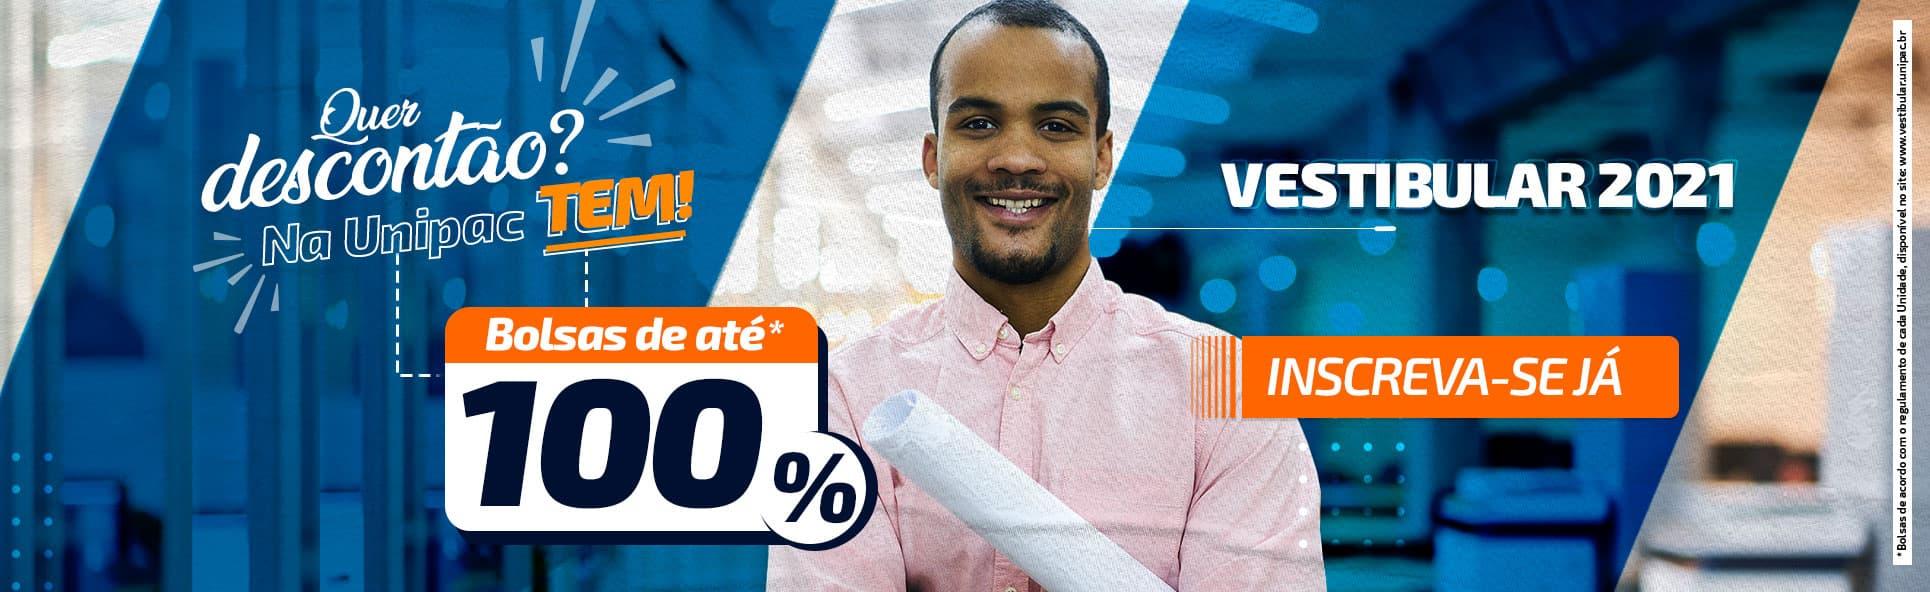 Vestibular Agendado – desktop – 29/01/2021